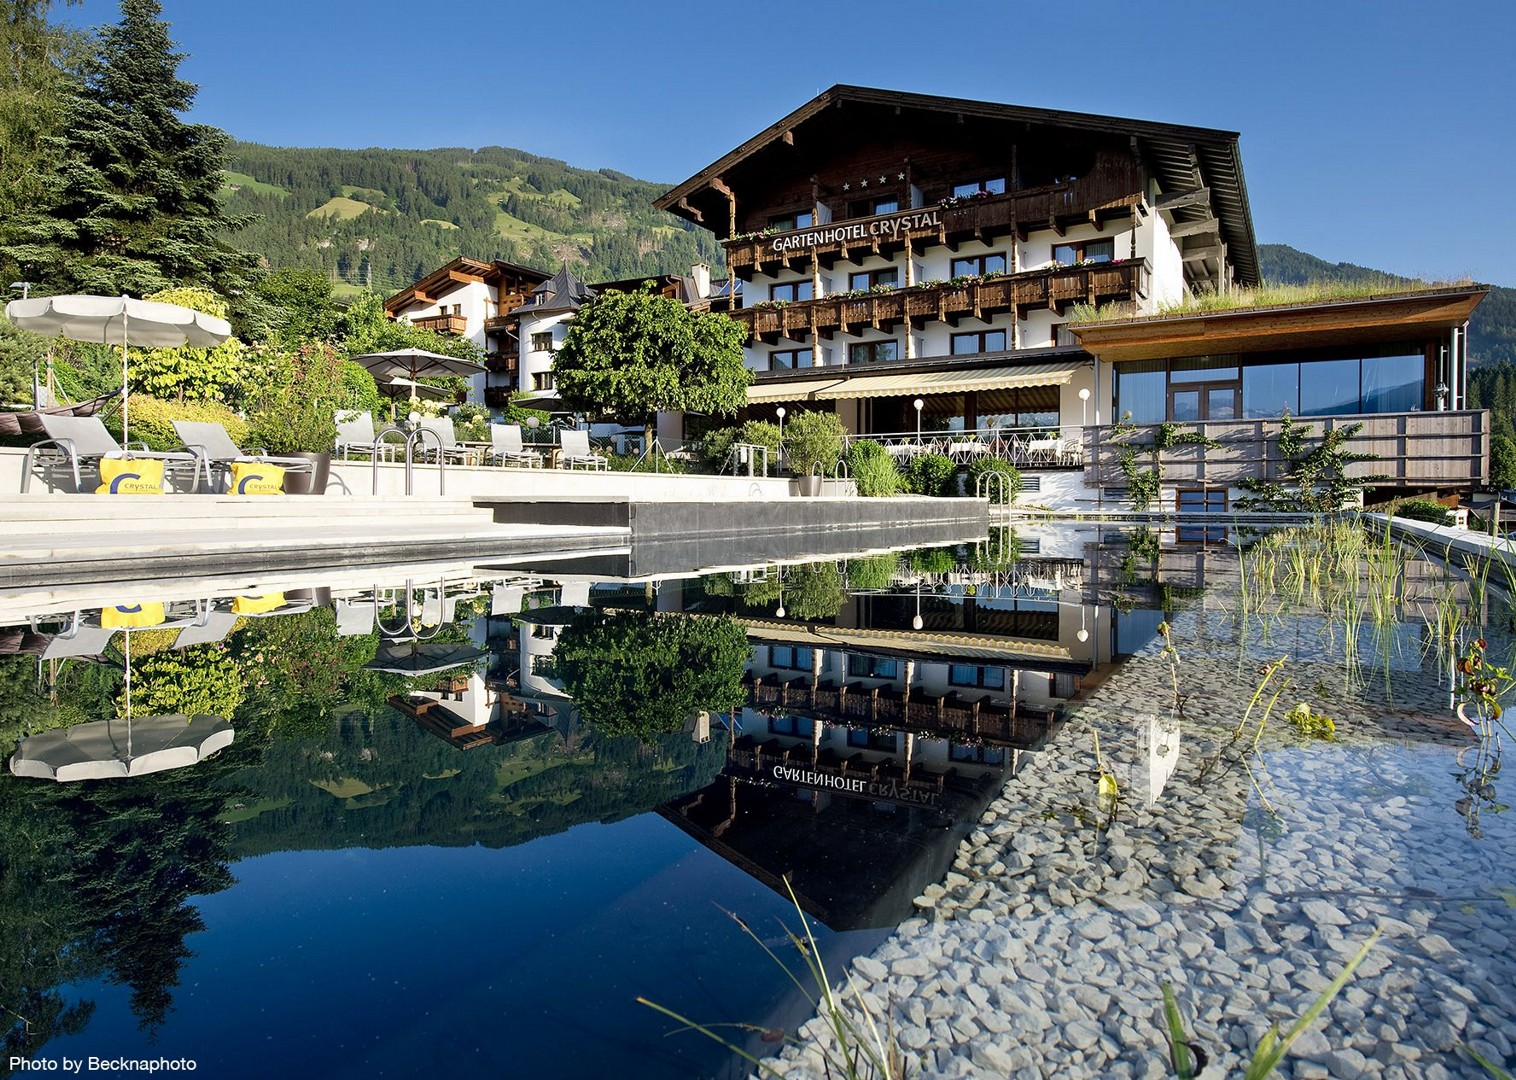 eb-crystal-fuegen-aussenansicht-15 copy.jpg - Austria - Tyrolean Valleys - Self-Guided Leisure Cycling Holiday - Leisure Cycling